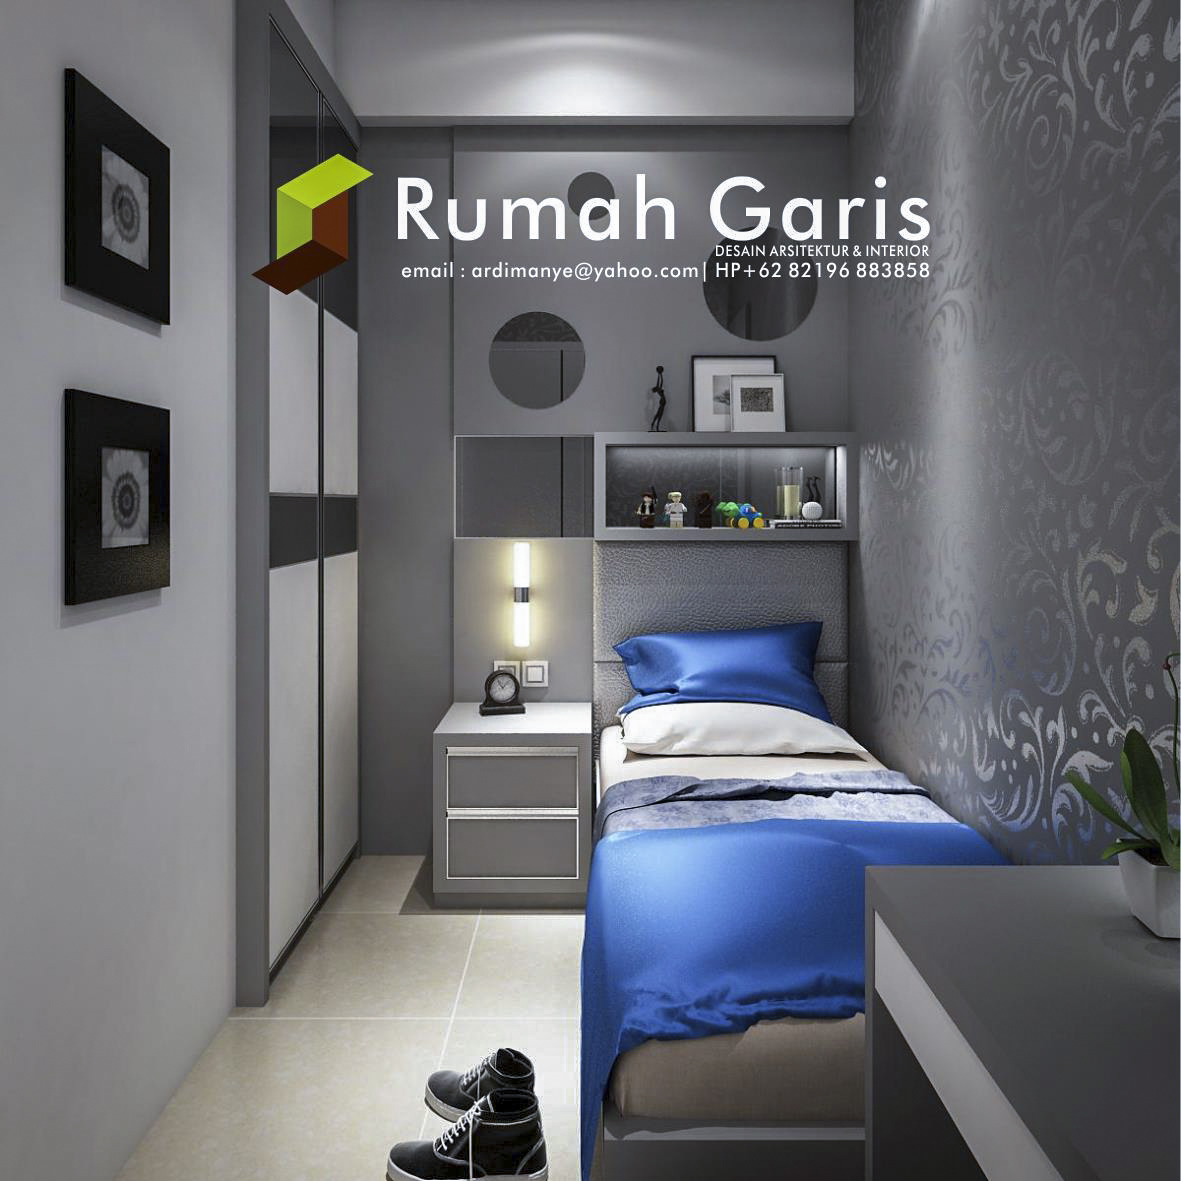 Desain interior apartemen mewah konsep klasik minimalis